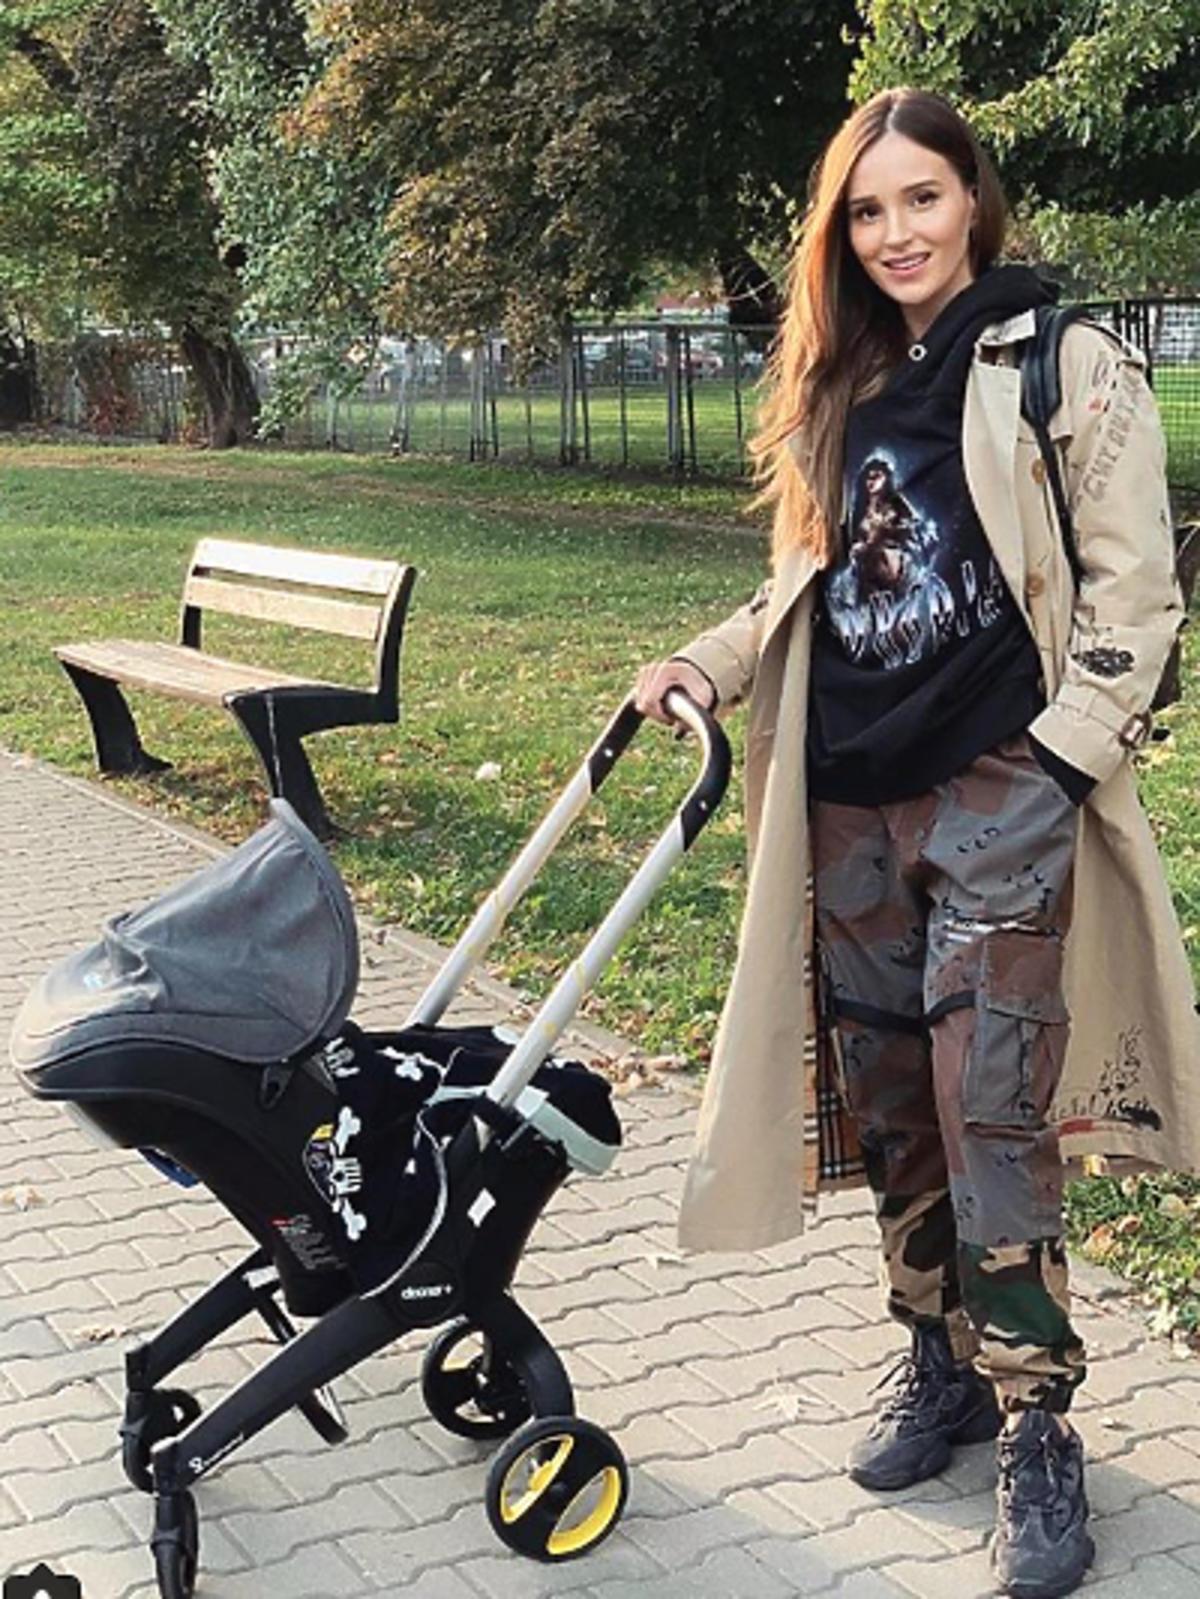 Marina pokazała wózek syna